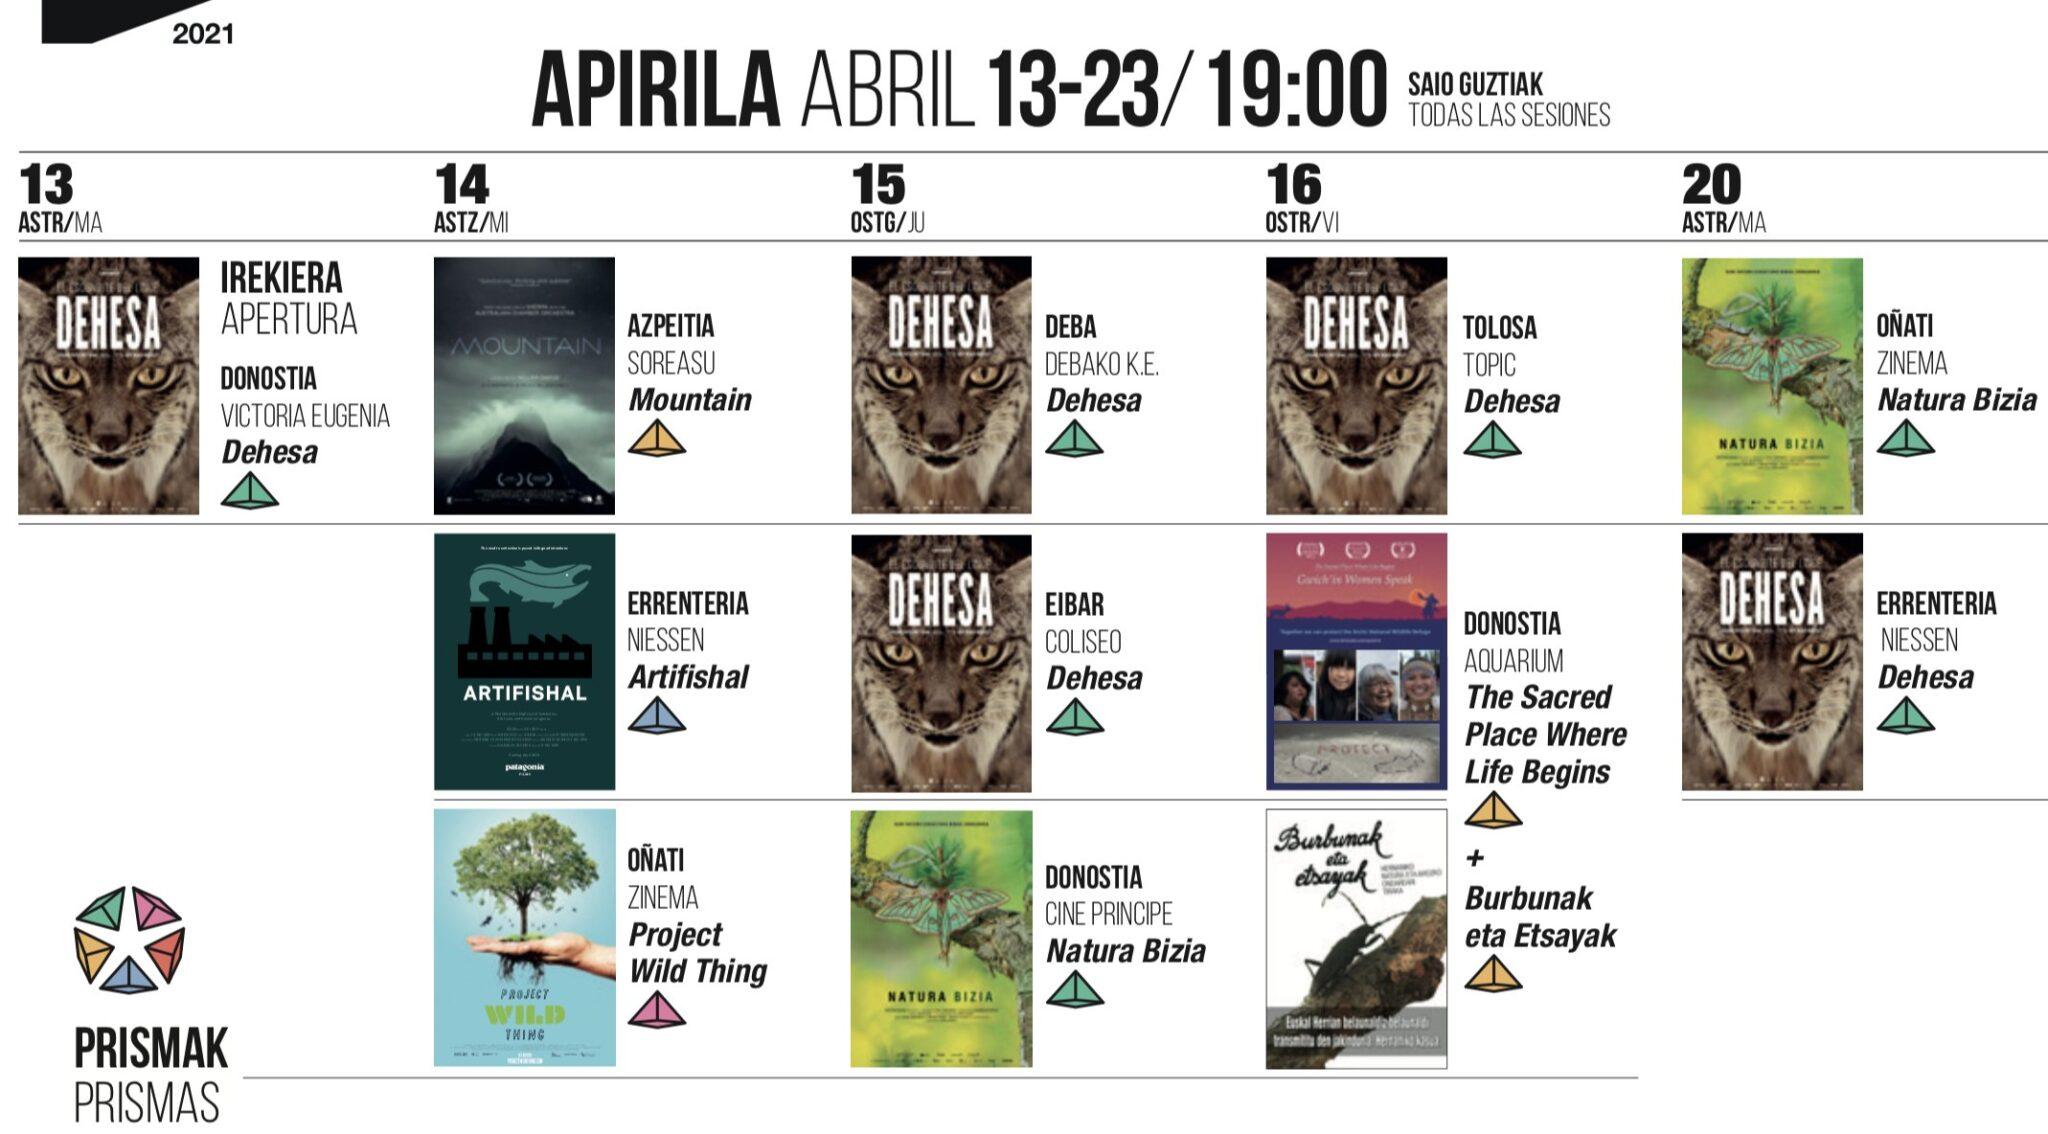 GNAT calendario scaled - Despega en Gipuzkoa la muestra de cine de la naturaleza (GNAT)